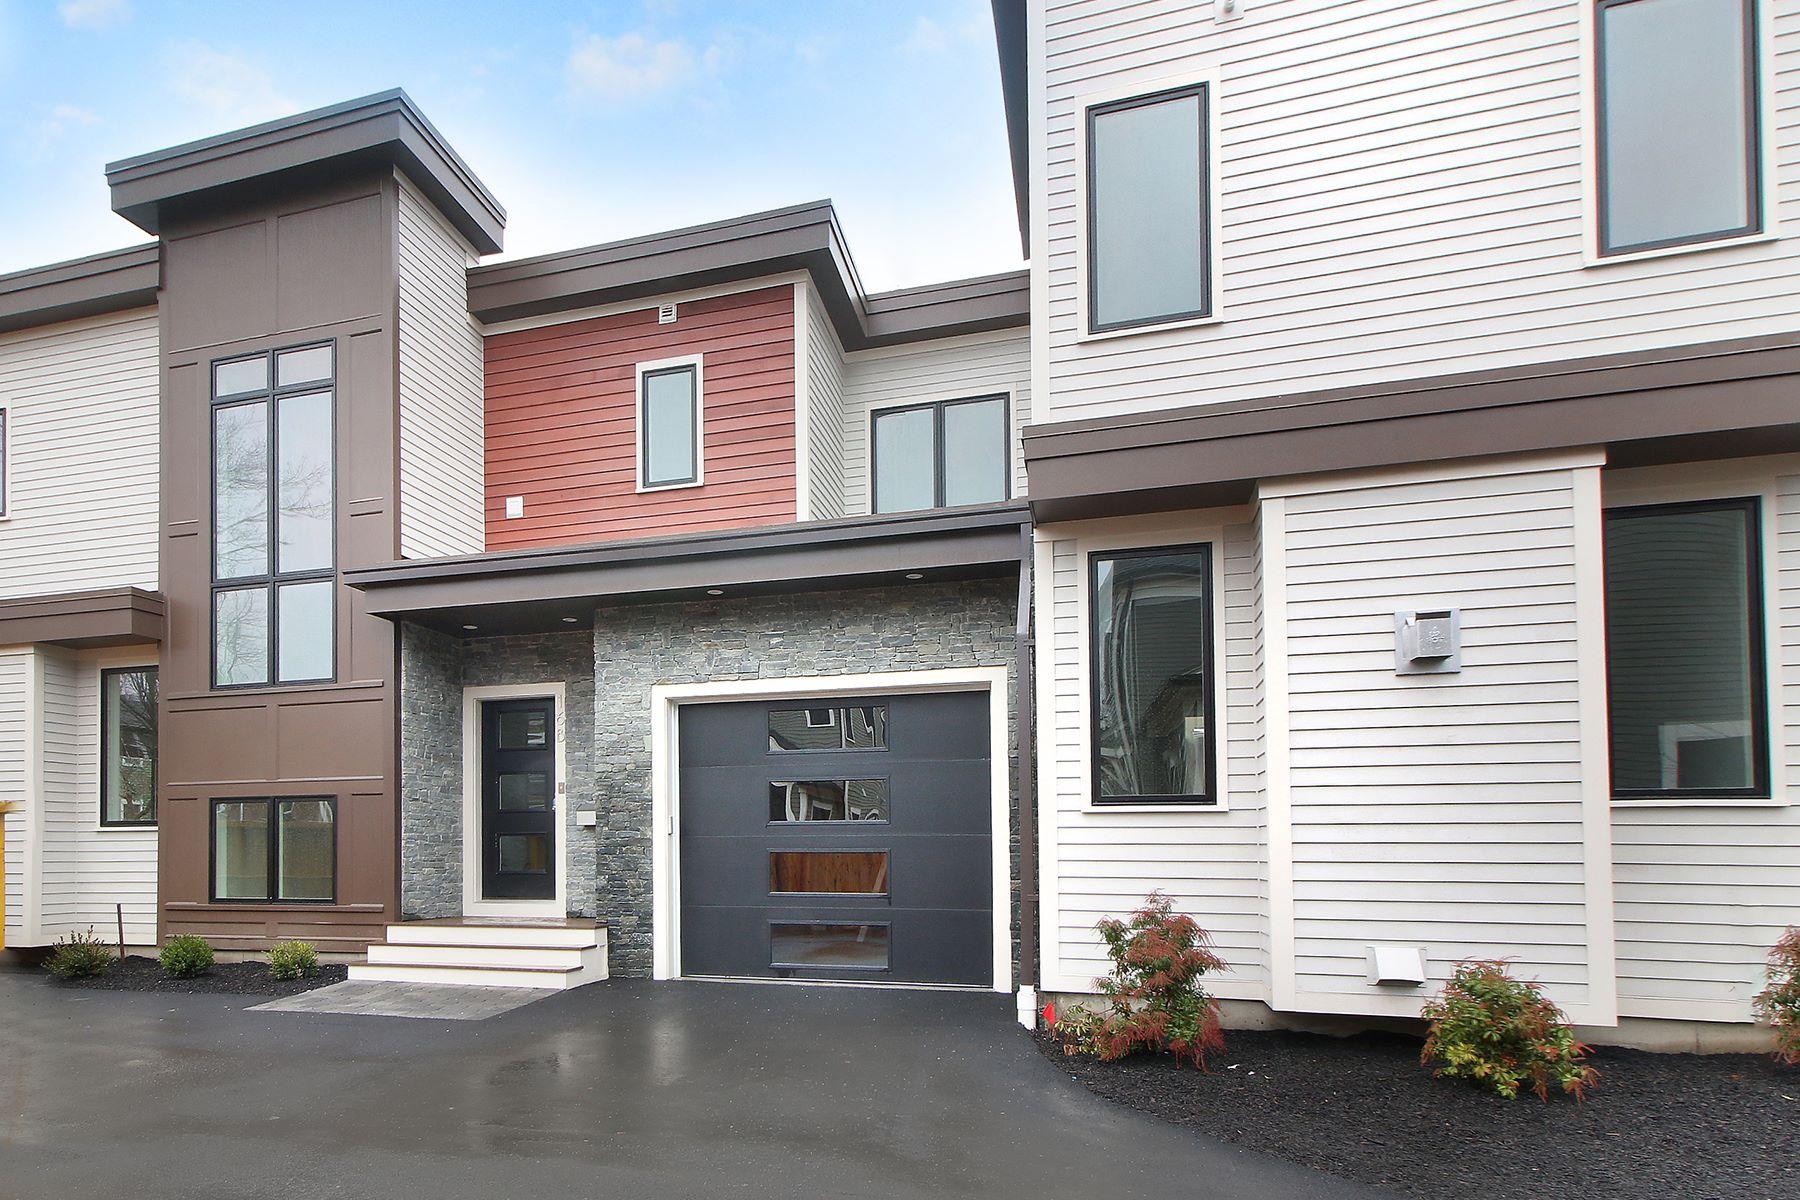 Condominium for Sale at 16 Keefe Ave B, Newton 16 Keefe Ave B Newton, Massachusetts 02464 United States